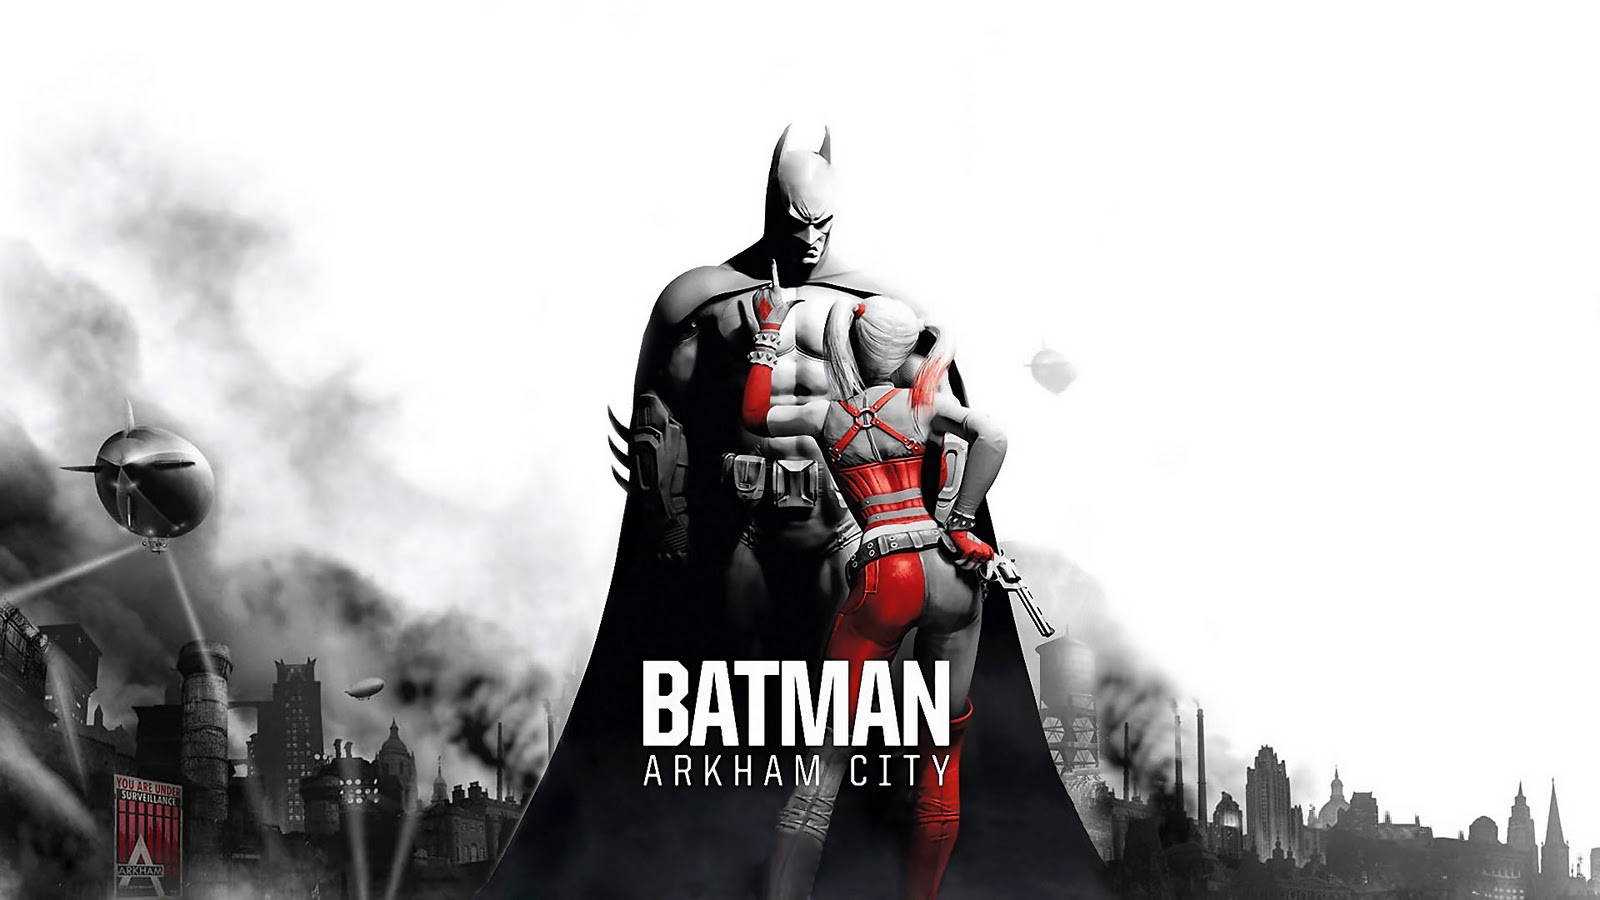 http://3.bp.blogspot.com/_cr8rbsuwFLE/TP_OKaqkh-I/AAAAAAAABGU/W4pK_FI3wew/s1600/Batman-Arkham-City-Harley-Quinn-Wallpaper-1080p.jpg